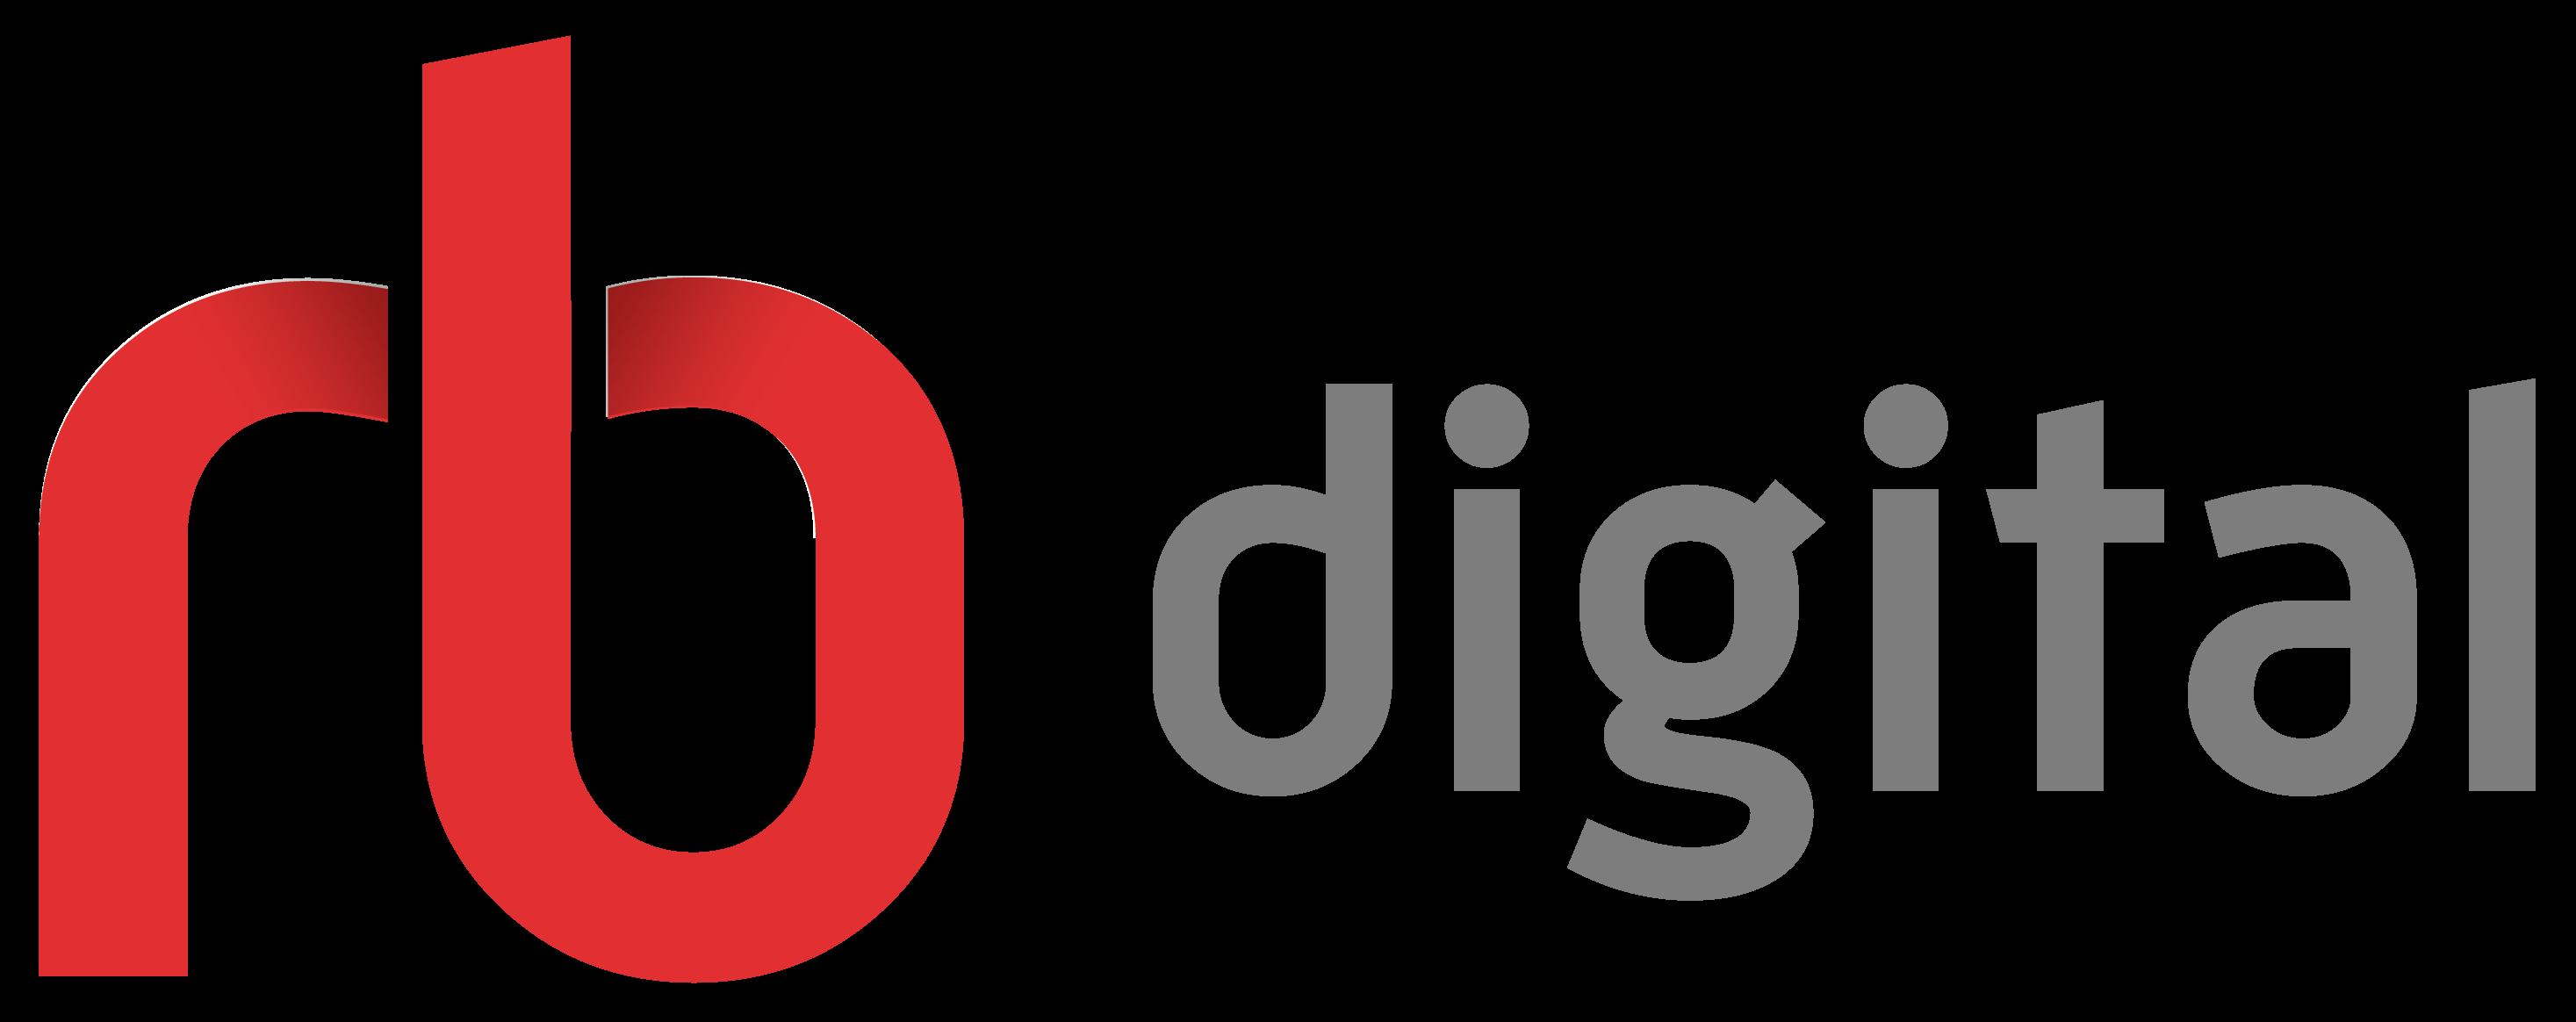 RBdigital2.png